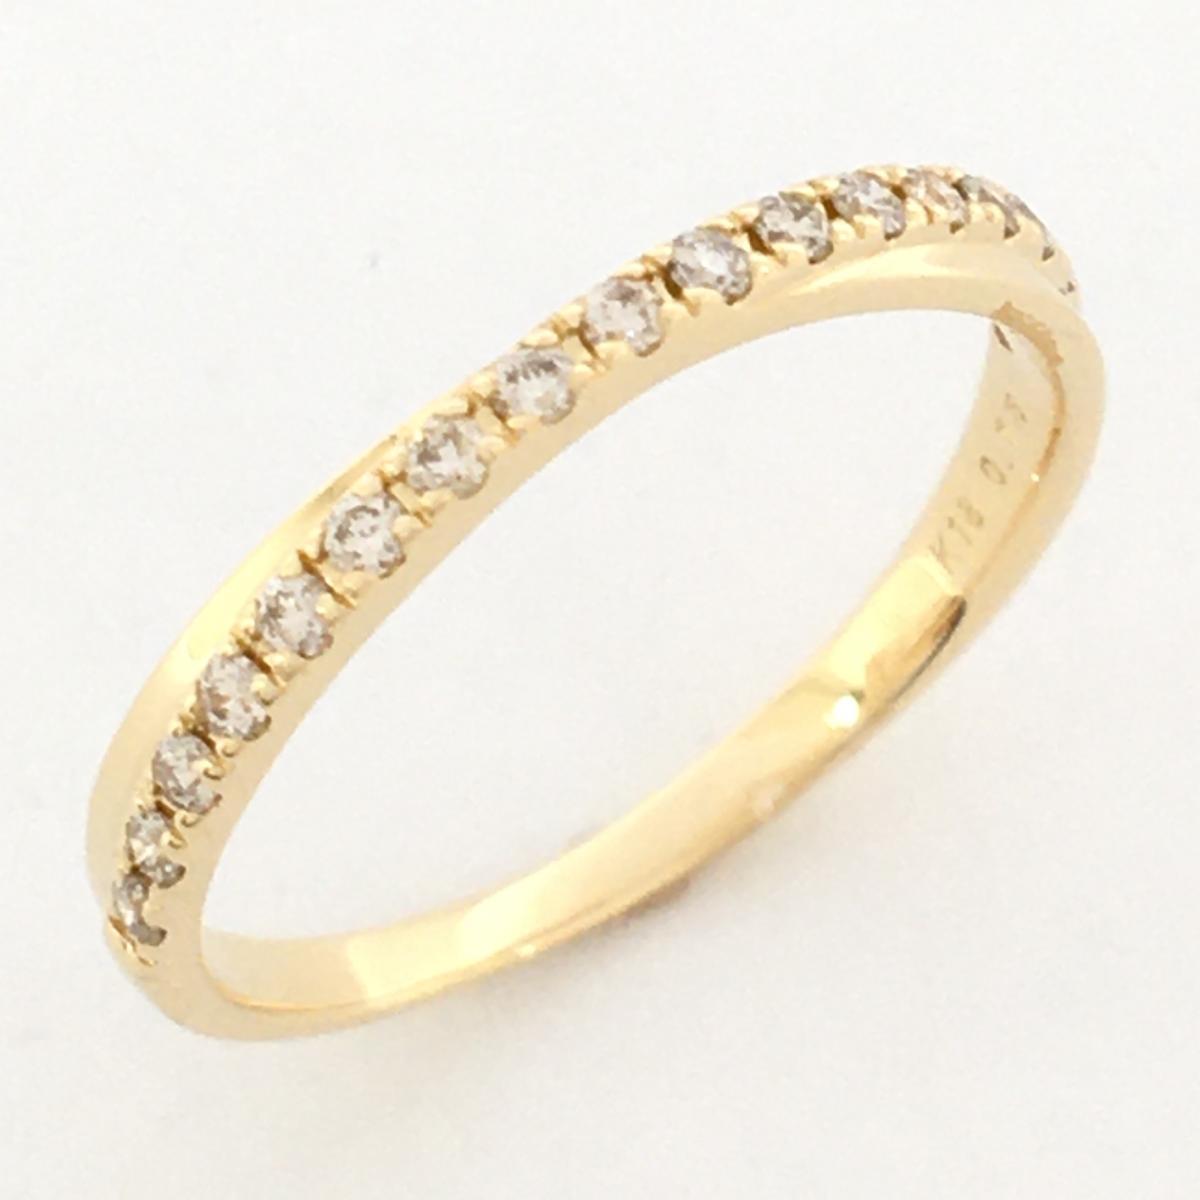 JEWELRY(ジュエリー)/ダイヤモンドリング 指輪/リング//K18YG(750)イエローゴールド×ダイヤモンド 0.15ct/【ランクS】/9.5号【中古】